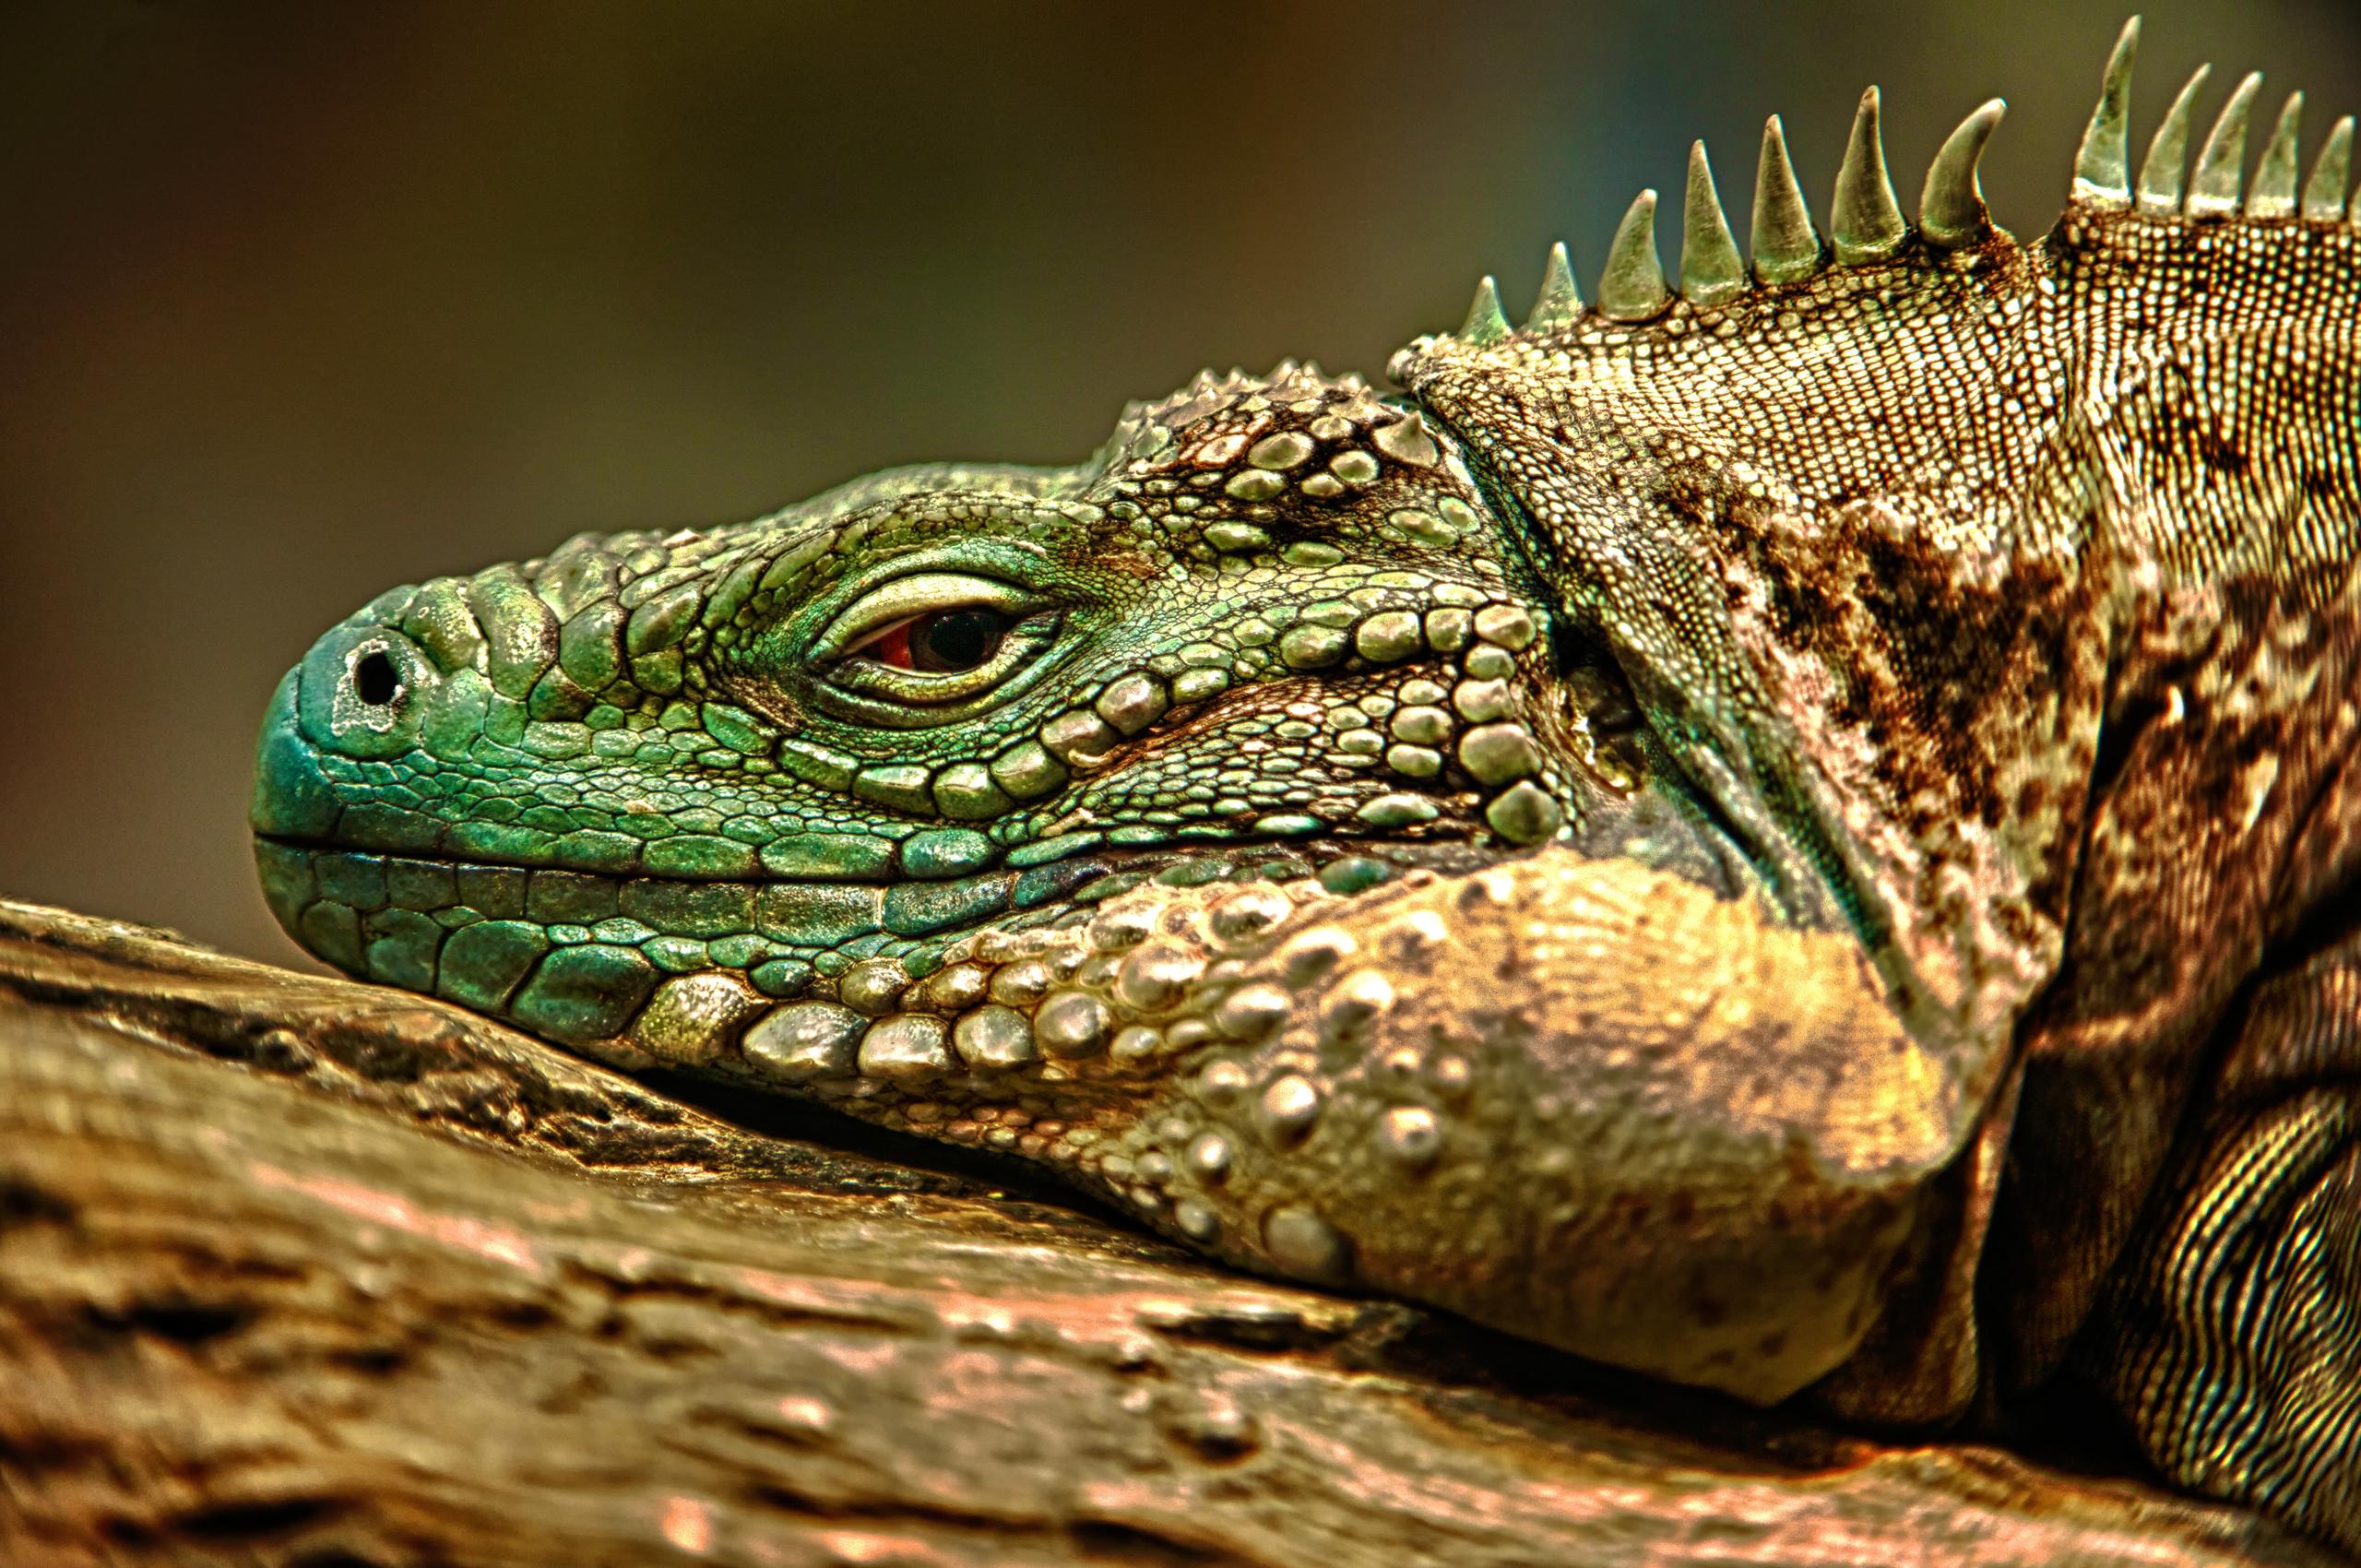 Lizard HD Wallpaper | Background Image | 2560x1700 | ID ...